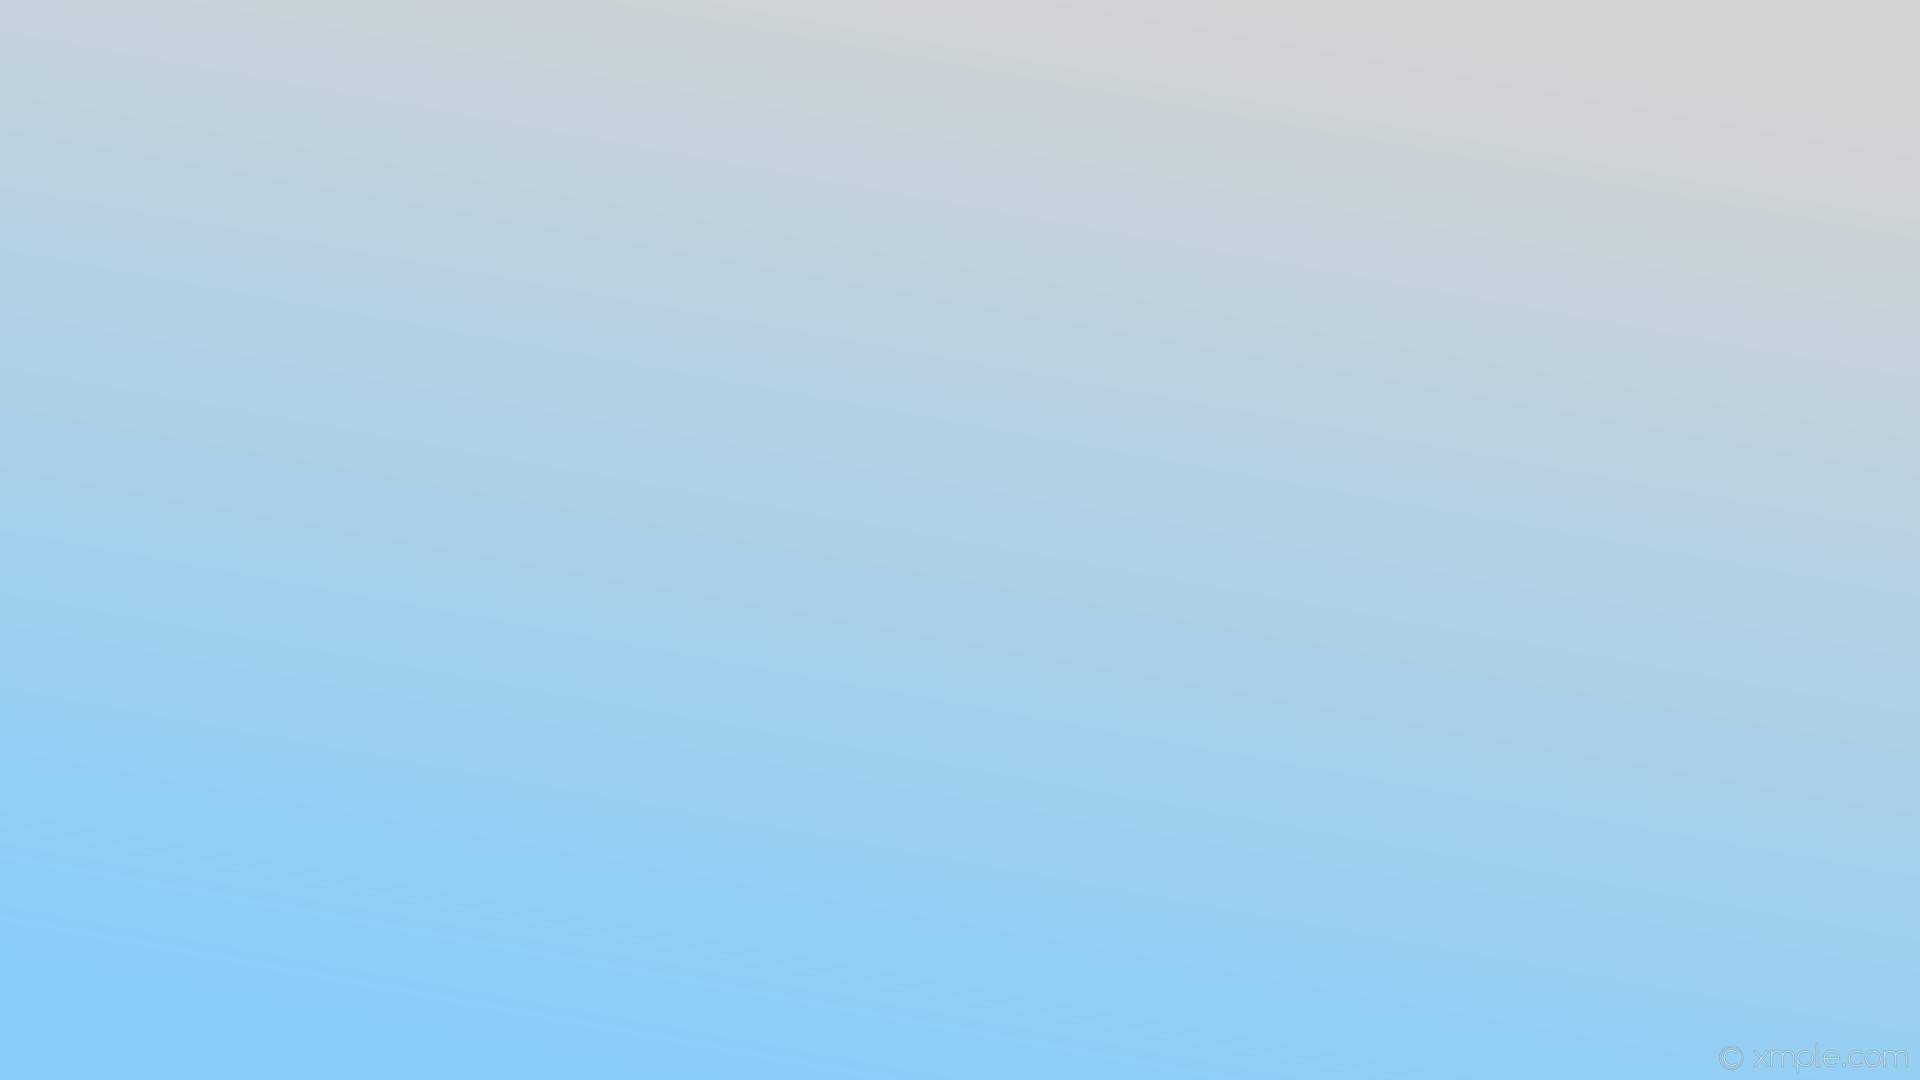 wallpaper gradient linear blue grey light gray light sky blue #d3d3d3  #87cefa 60°